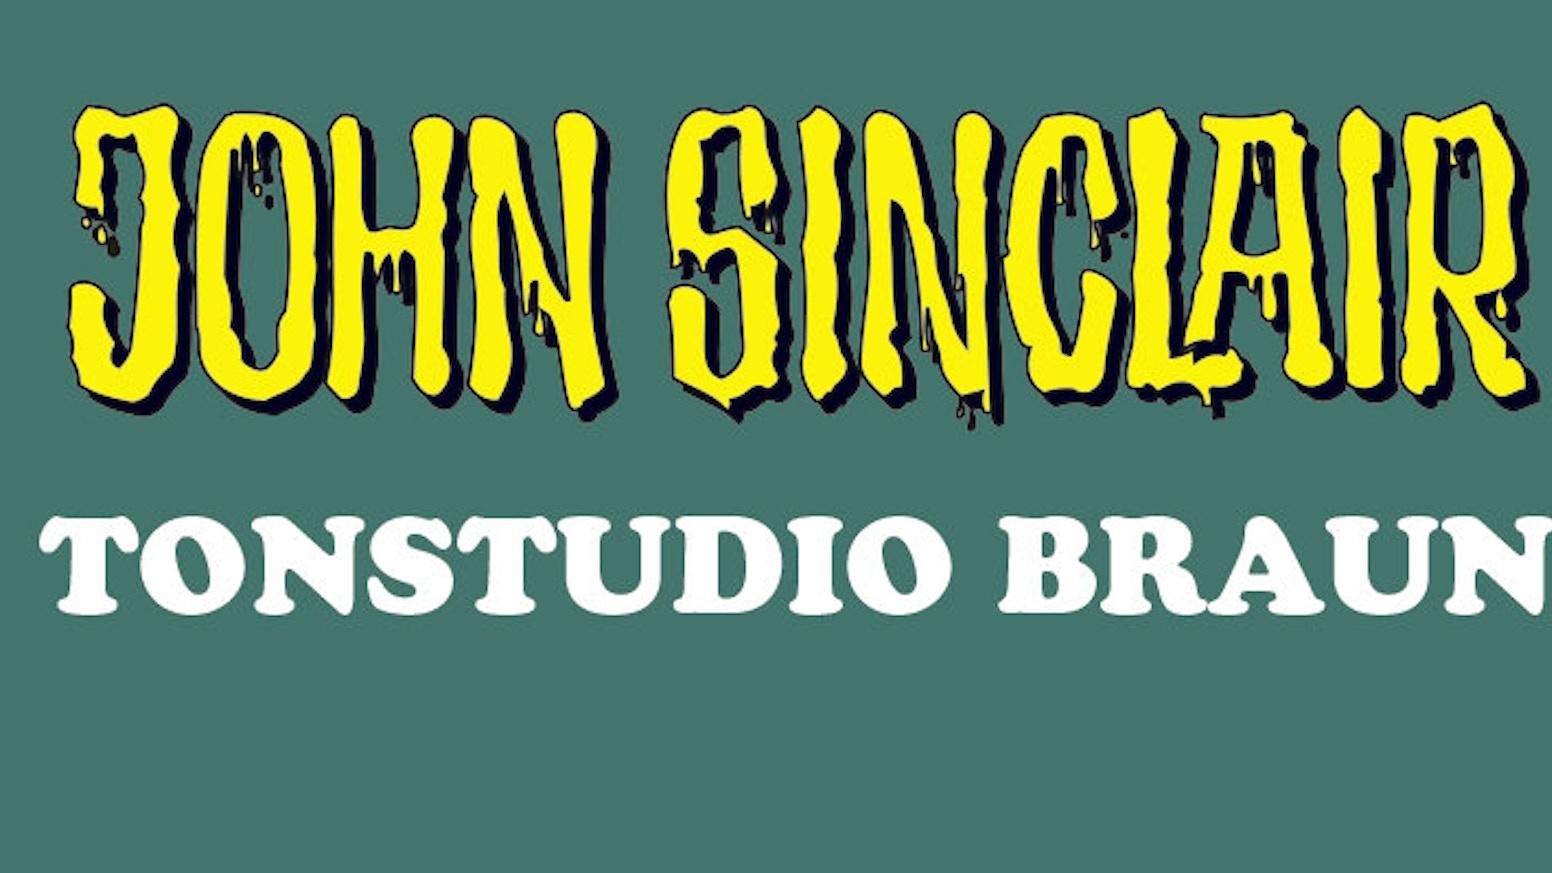 "John Sinclair Tonstudio Braun Klassiker Folge 1 ""Das Horror-Schloß im Spessart"" auf Doppel Vinyl/LP"